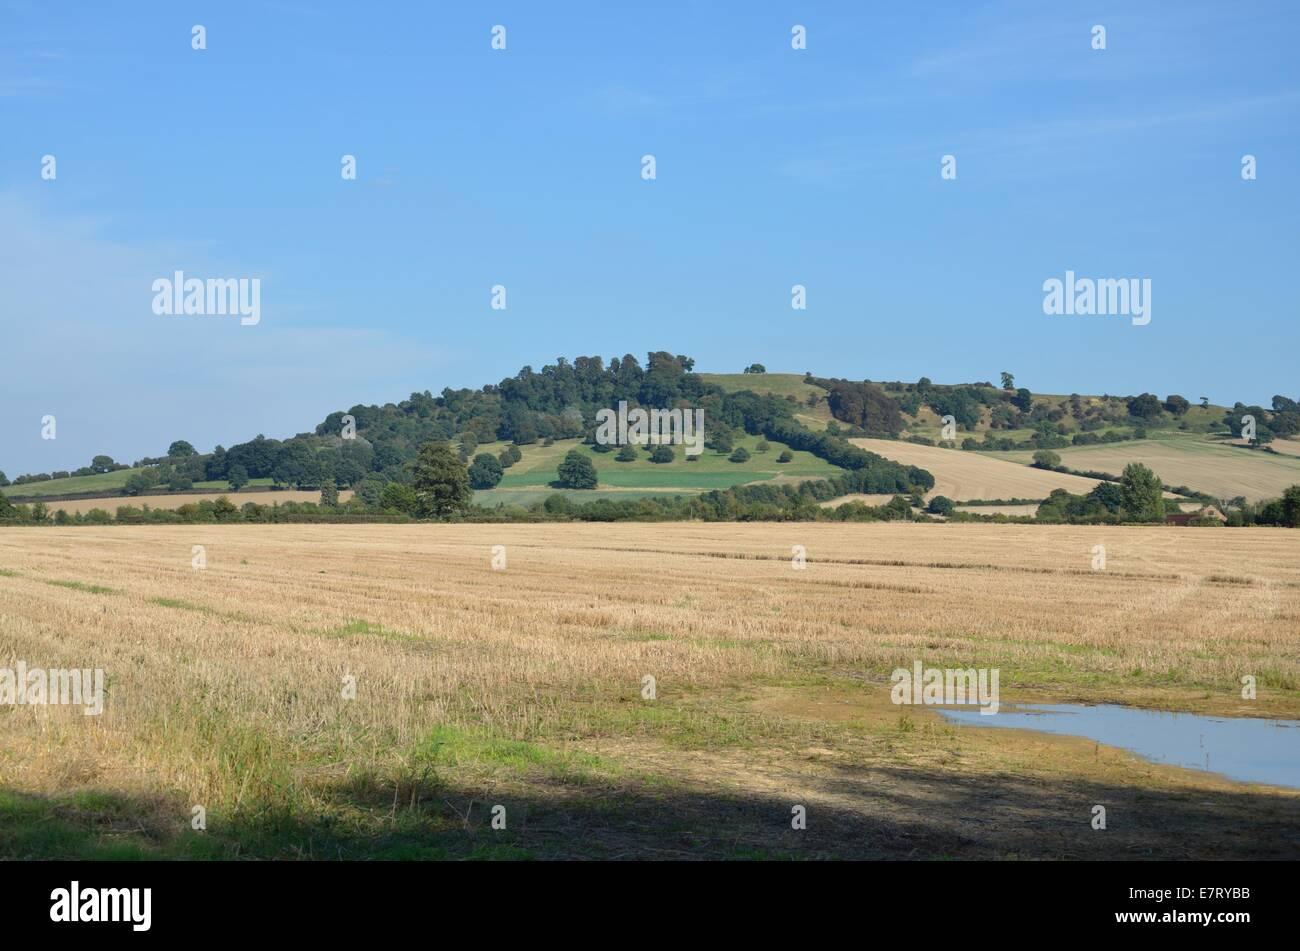 Meon Hill, Warwickshire - Stock Image